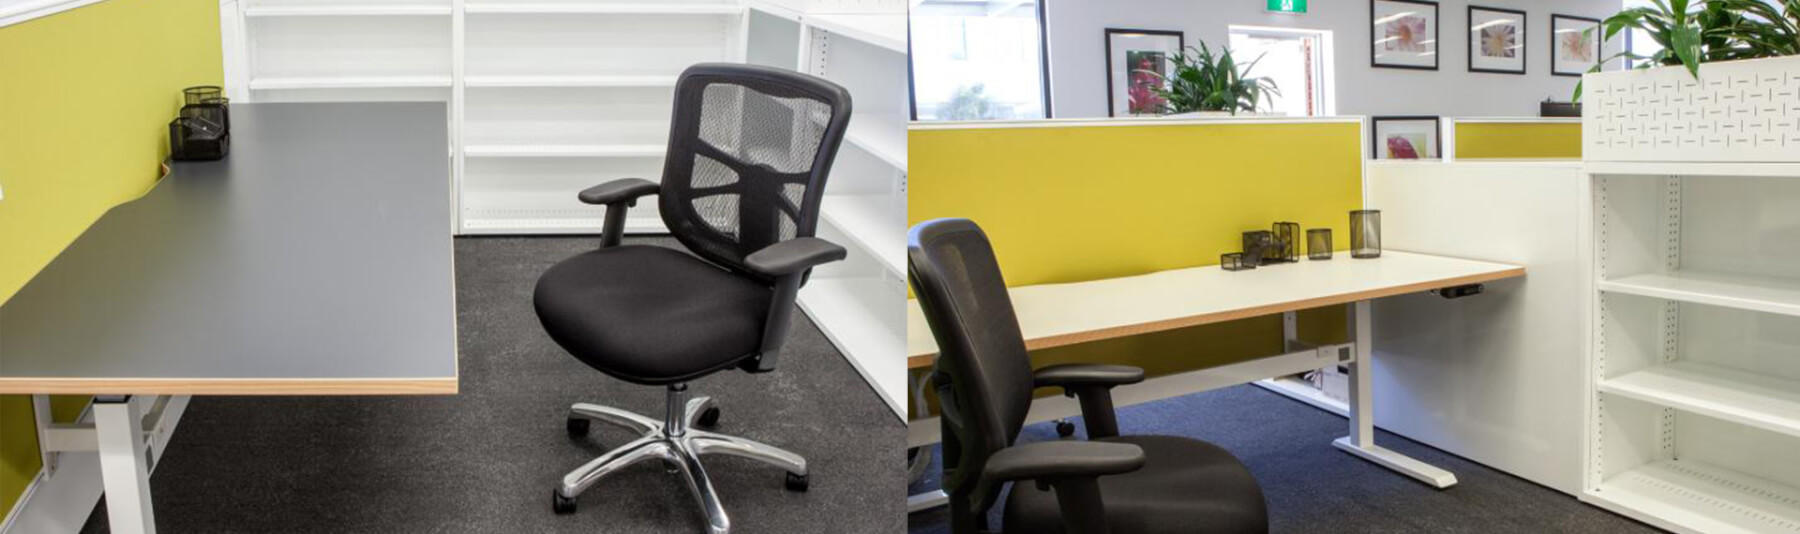 Buro Metro comfortable task chair